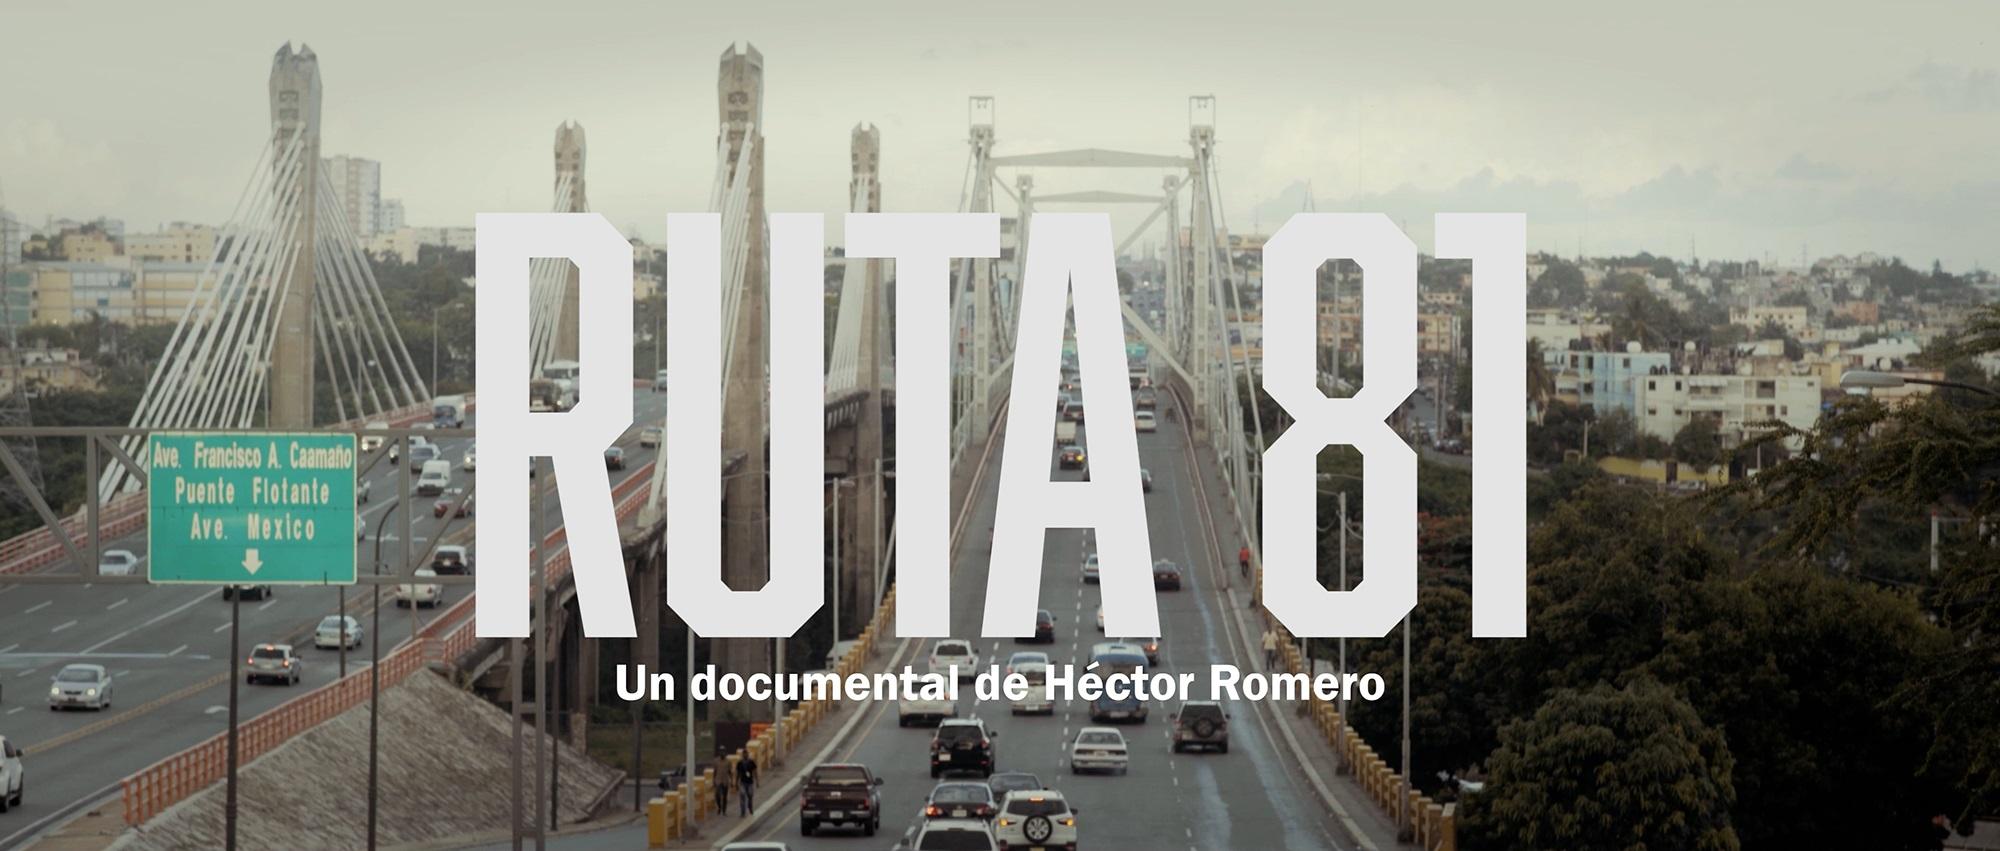 Ruta 81 pelicula documental de Hector Romero